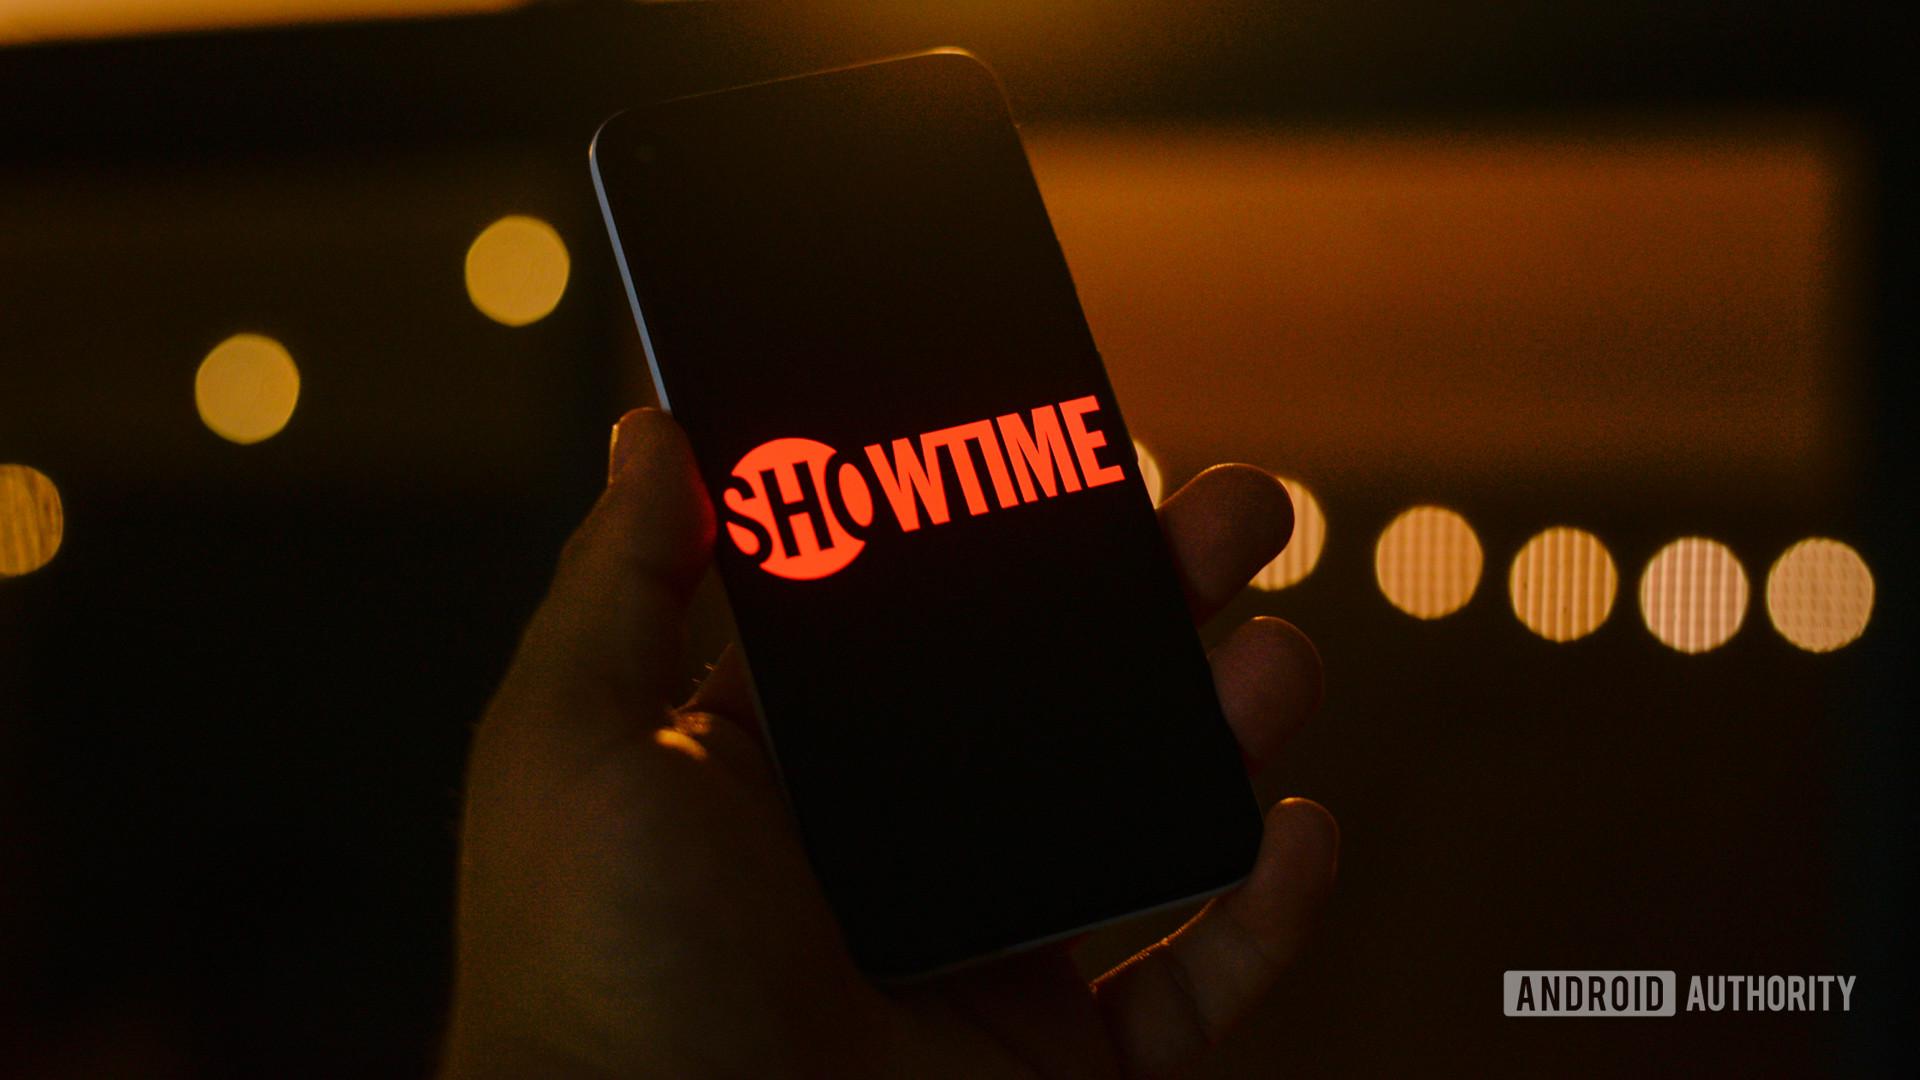 Showtime stock photo 2